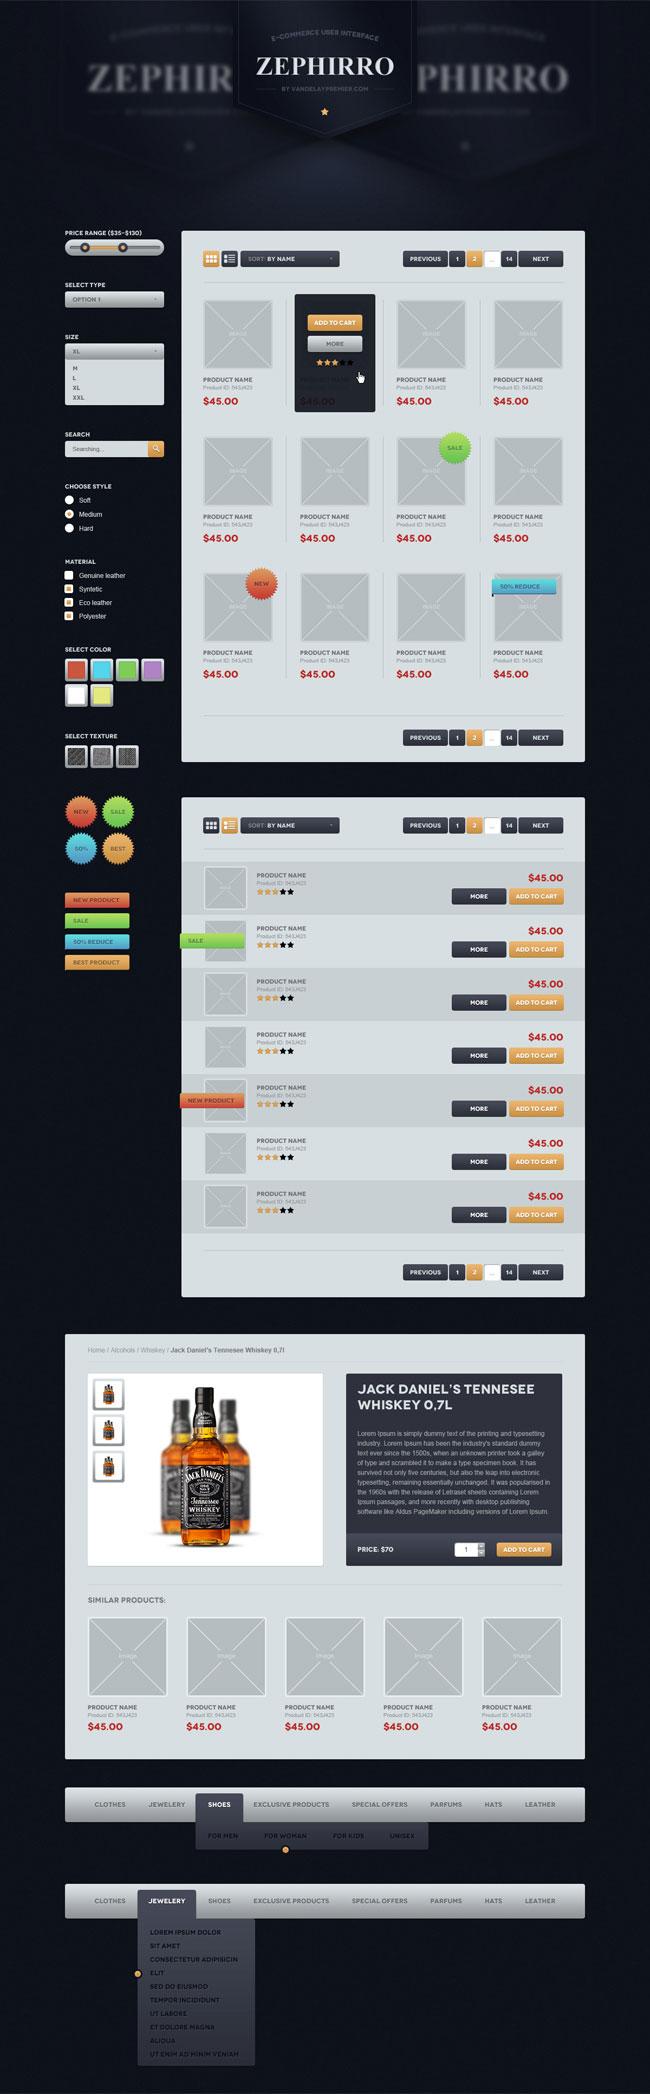 Inspired Deal: Ultimate Web Designers Bundle   only $39! (reg. $202)